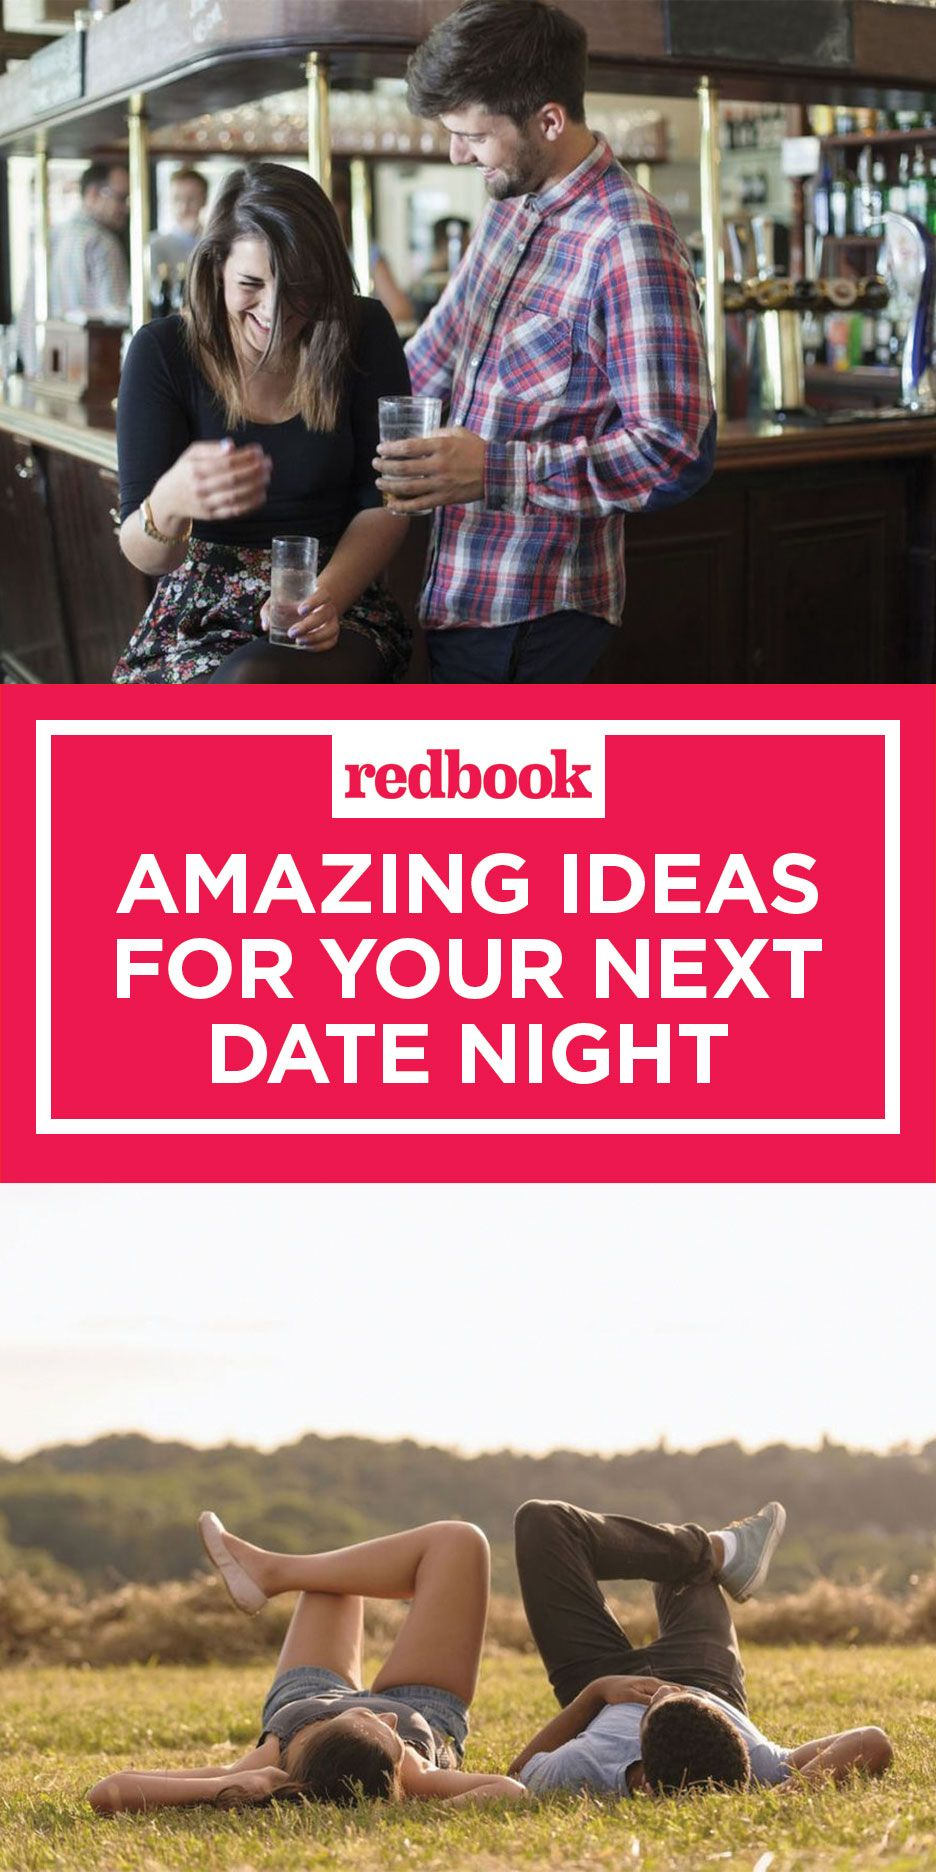 Sexy date night ideas in Melbourne